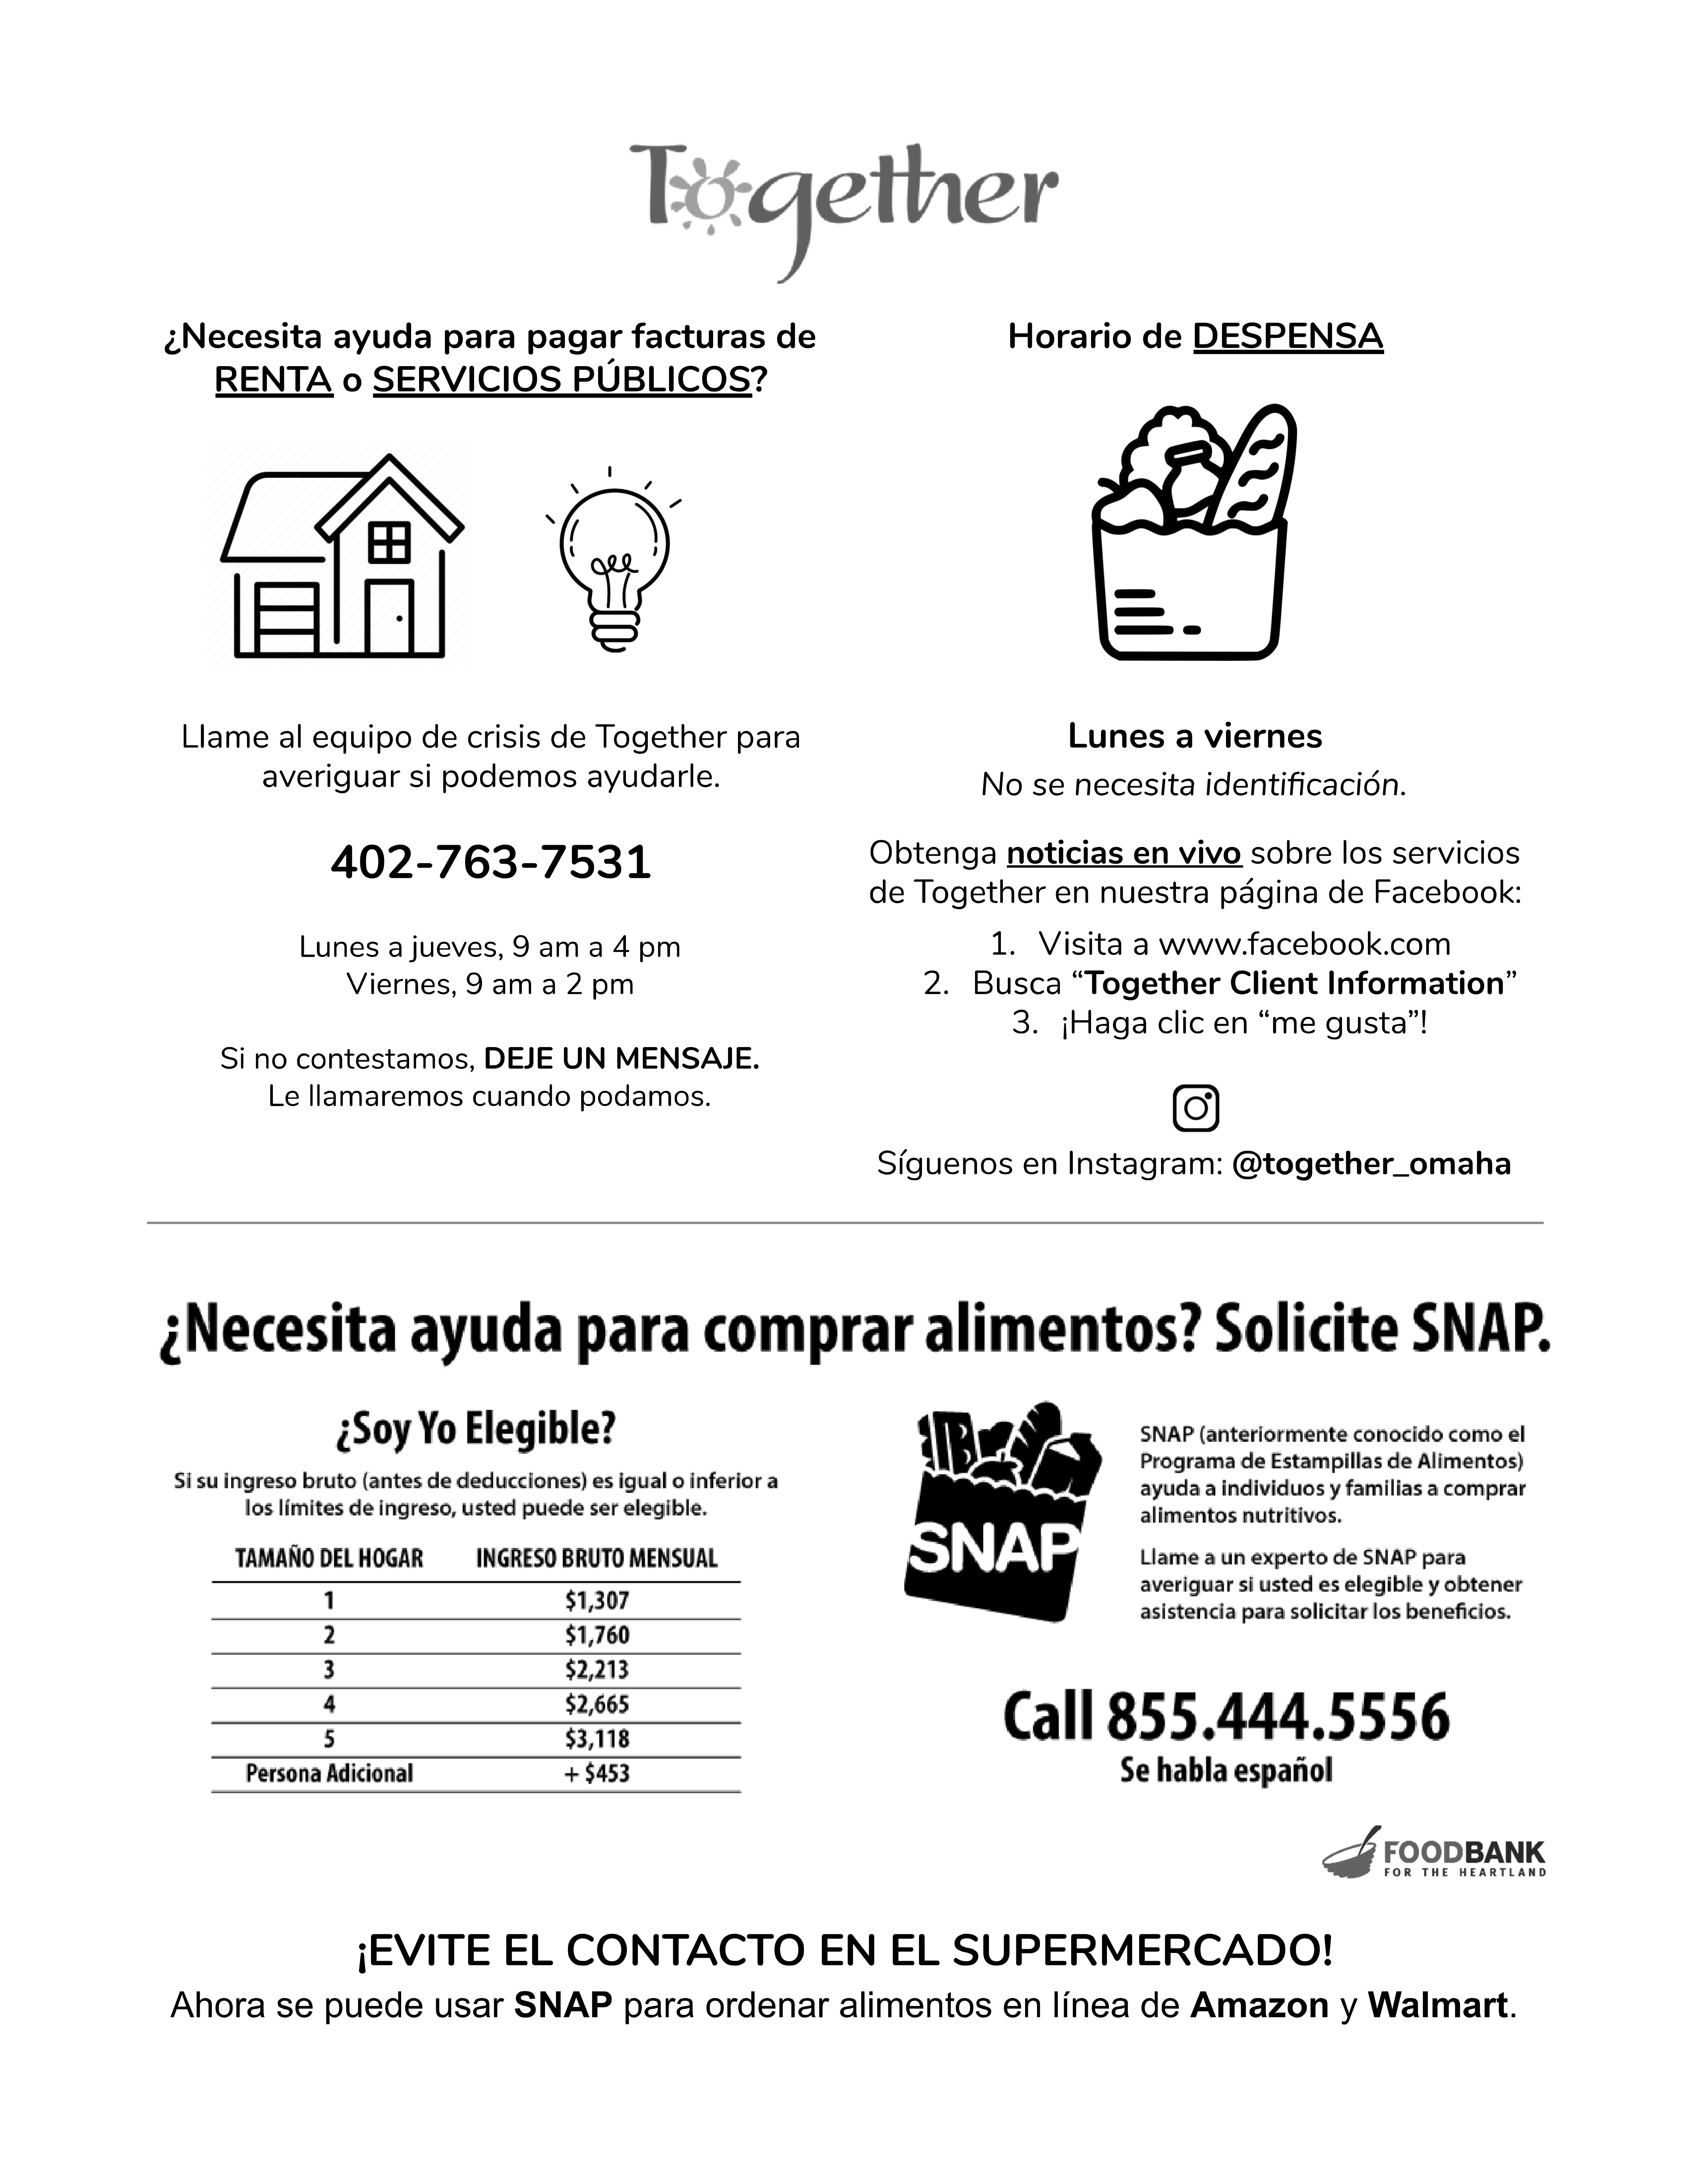 COVID-19 Resource Guide 1 (Spanish)